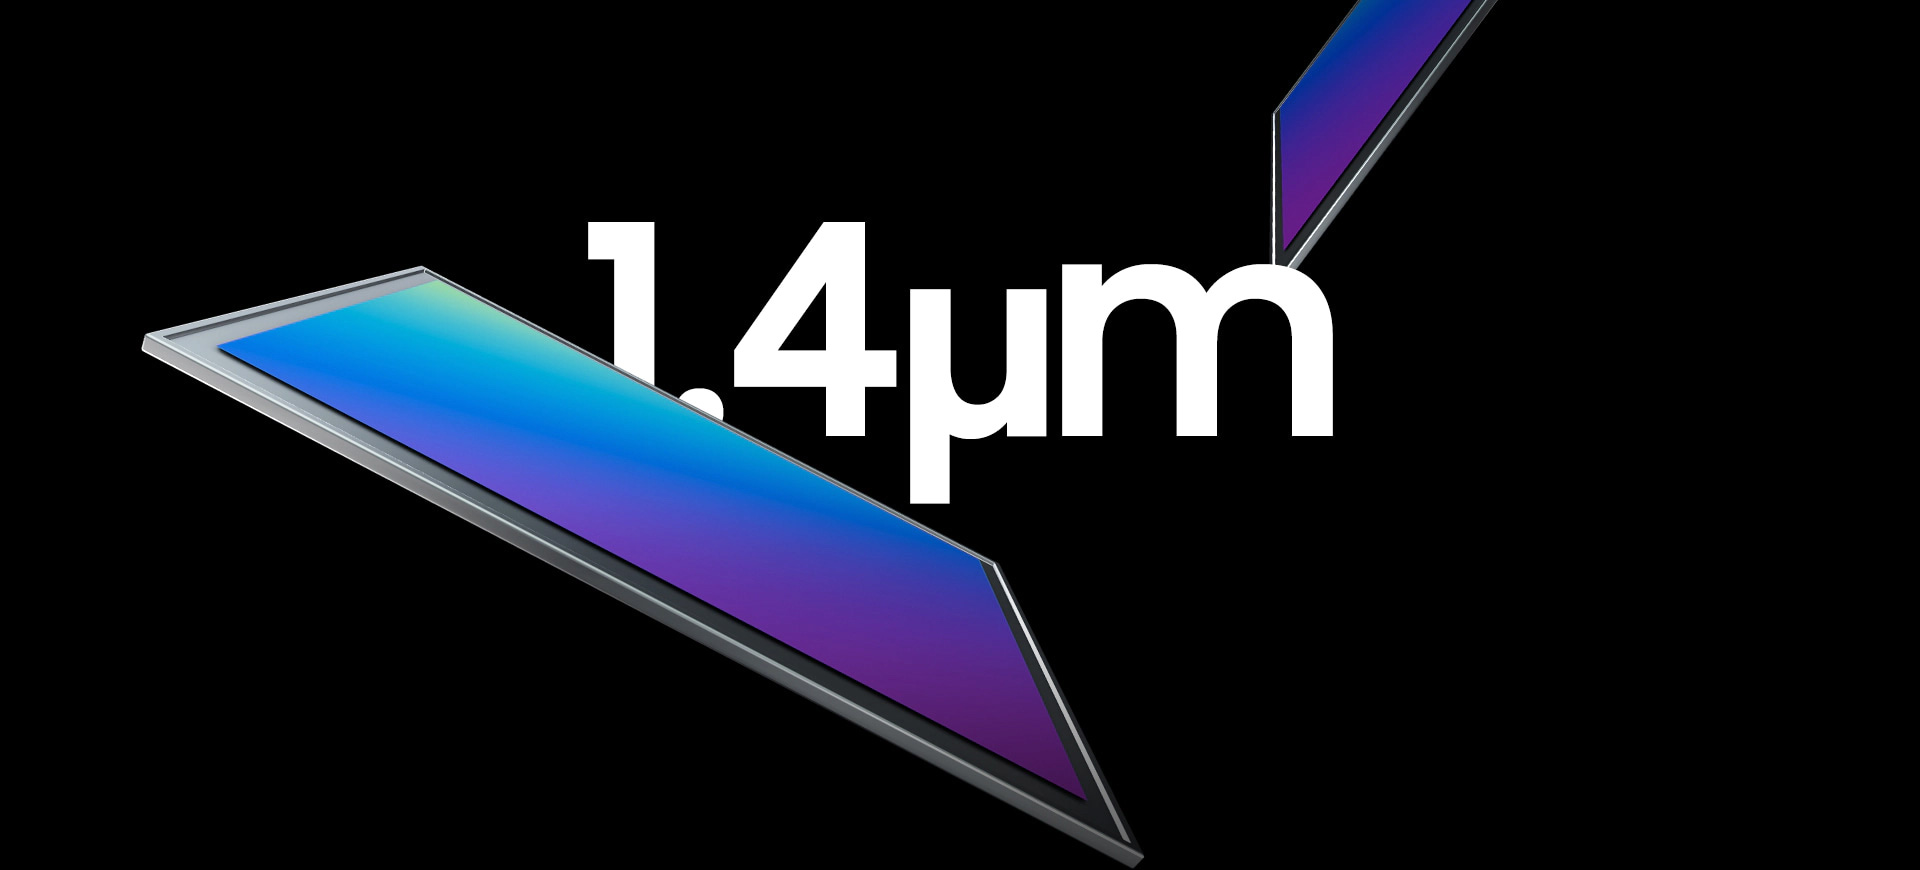 Largest smartphone sensor - so far: Samsung ISOCELL GN2